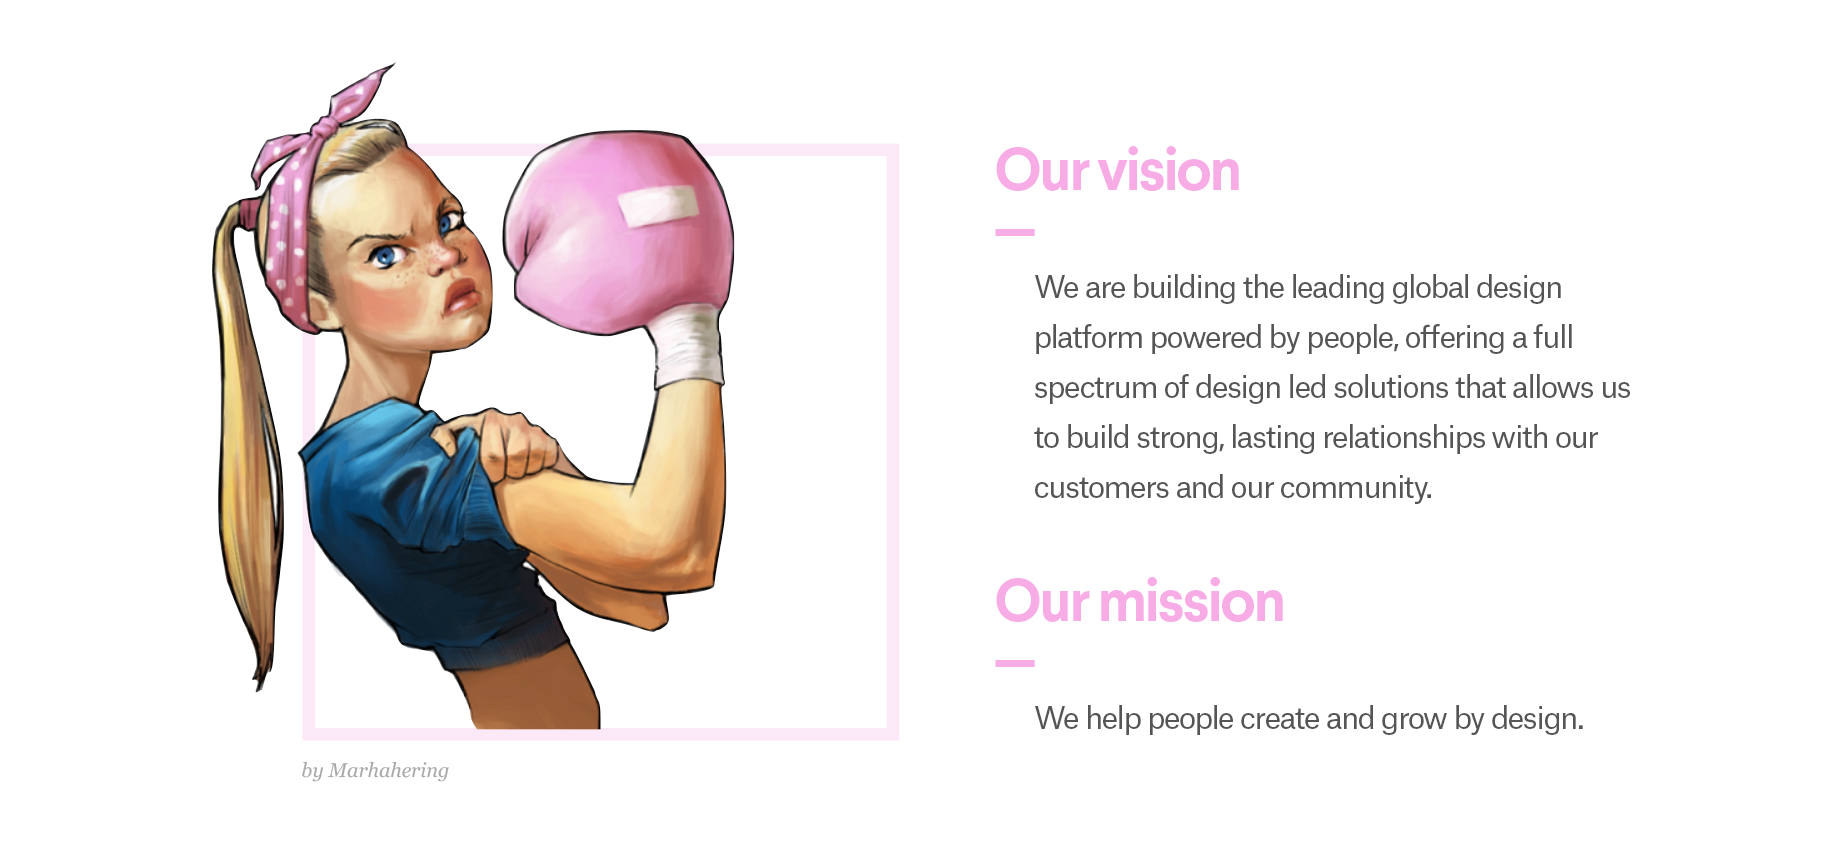 99d vision mission